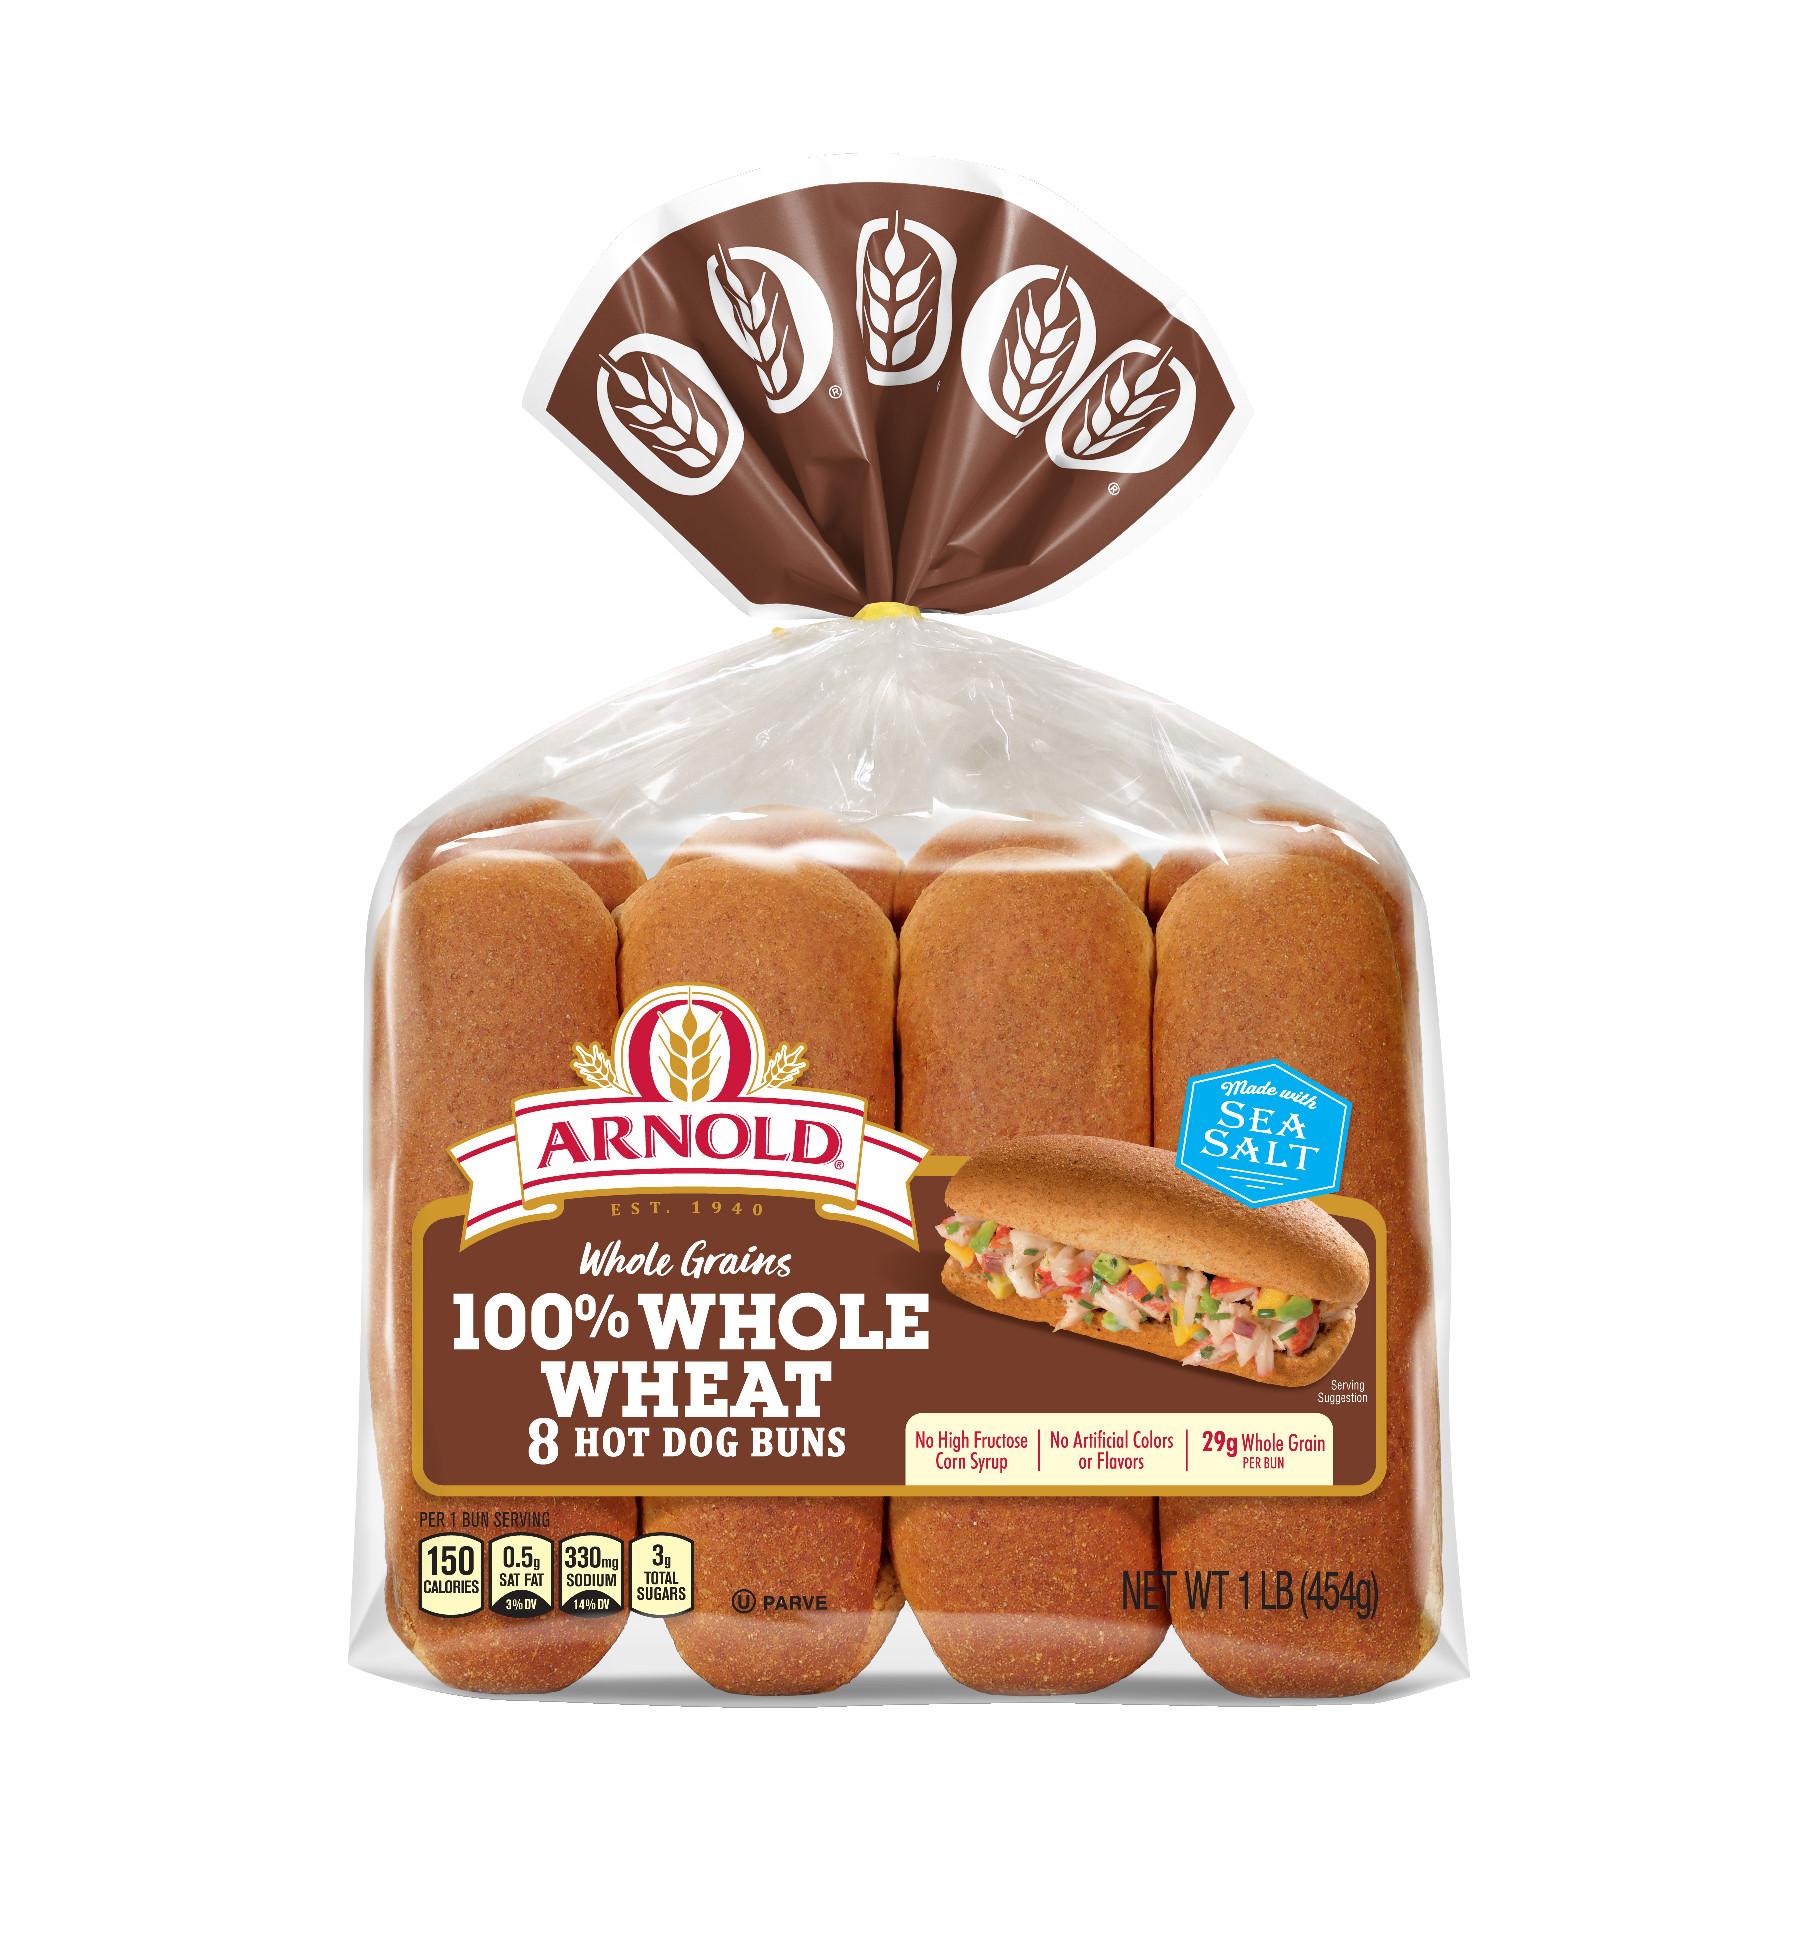 Arnold Whole Grain 100% Whole Wheat Hot Dog Buns, 8 Buns, 16 oz